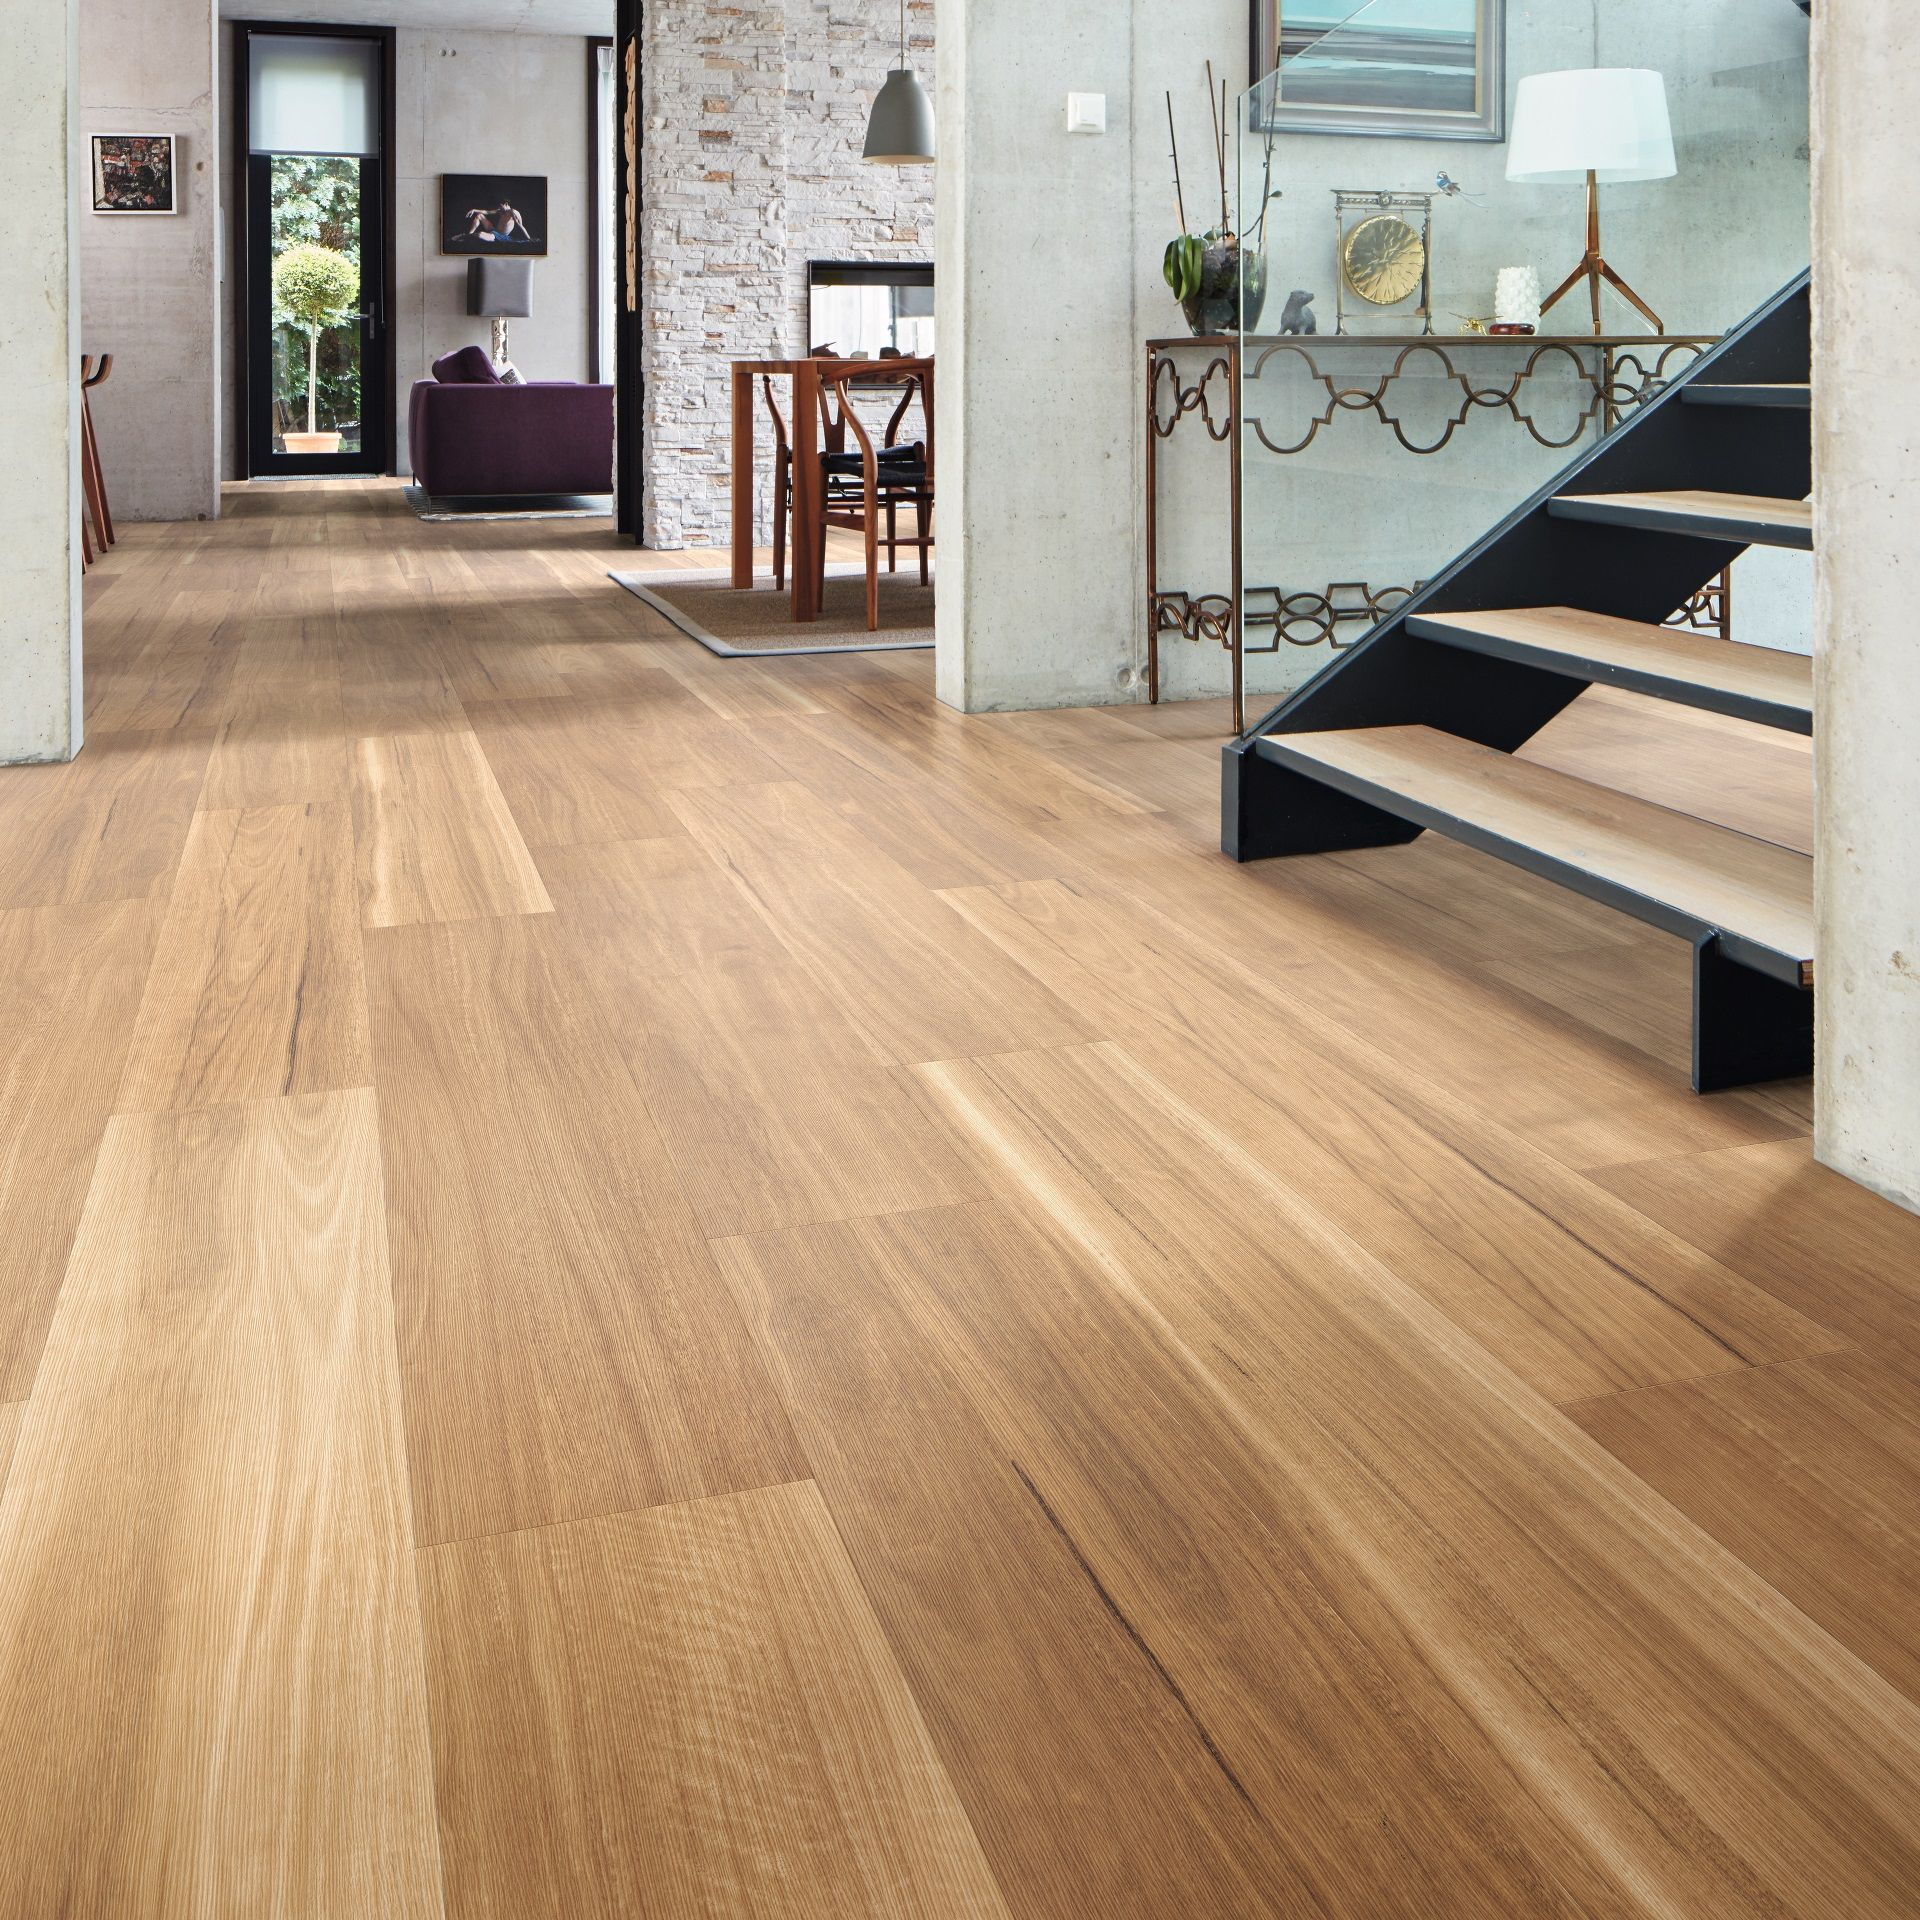 Karndean LooseLay Longboard Vinyl Flooring Collection